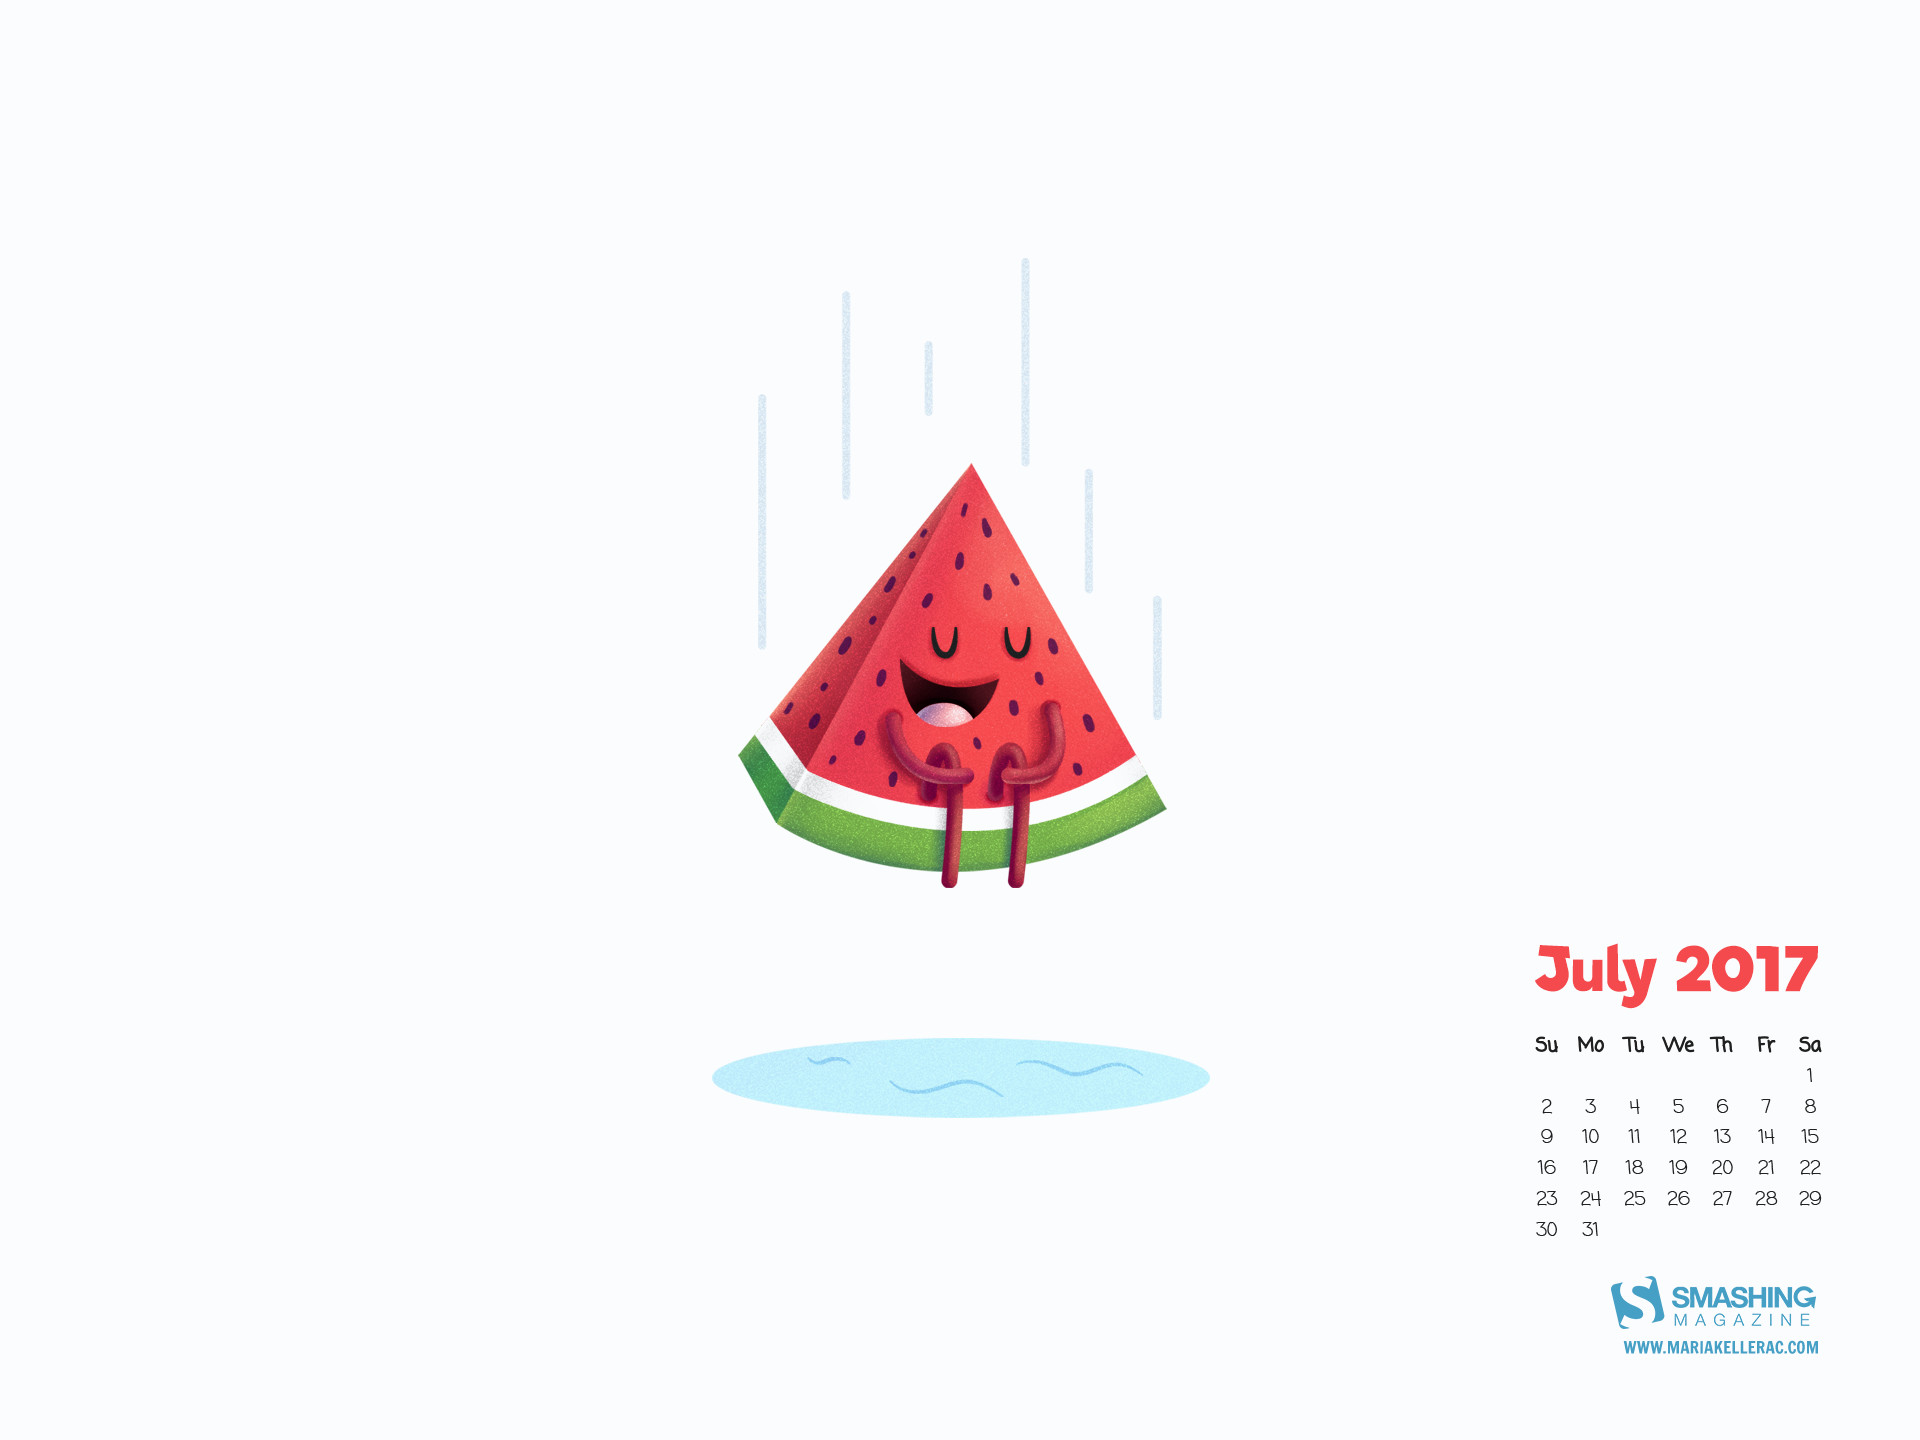 July Calendar Wallpaper : July calendar wallpapers ·①